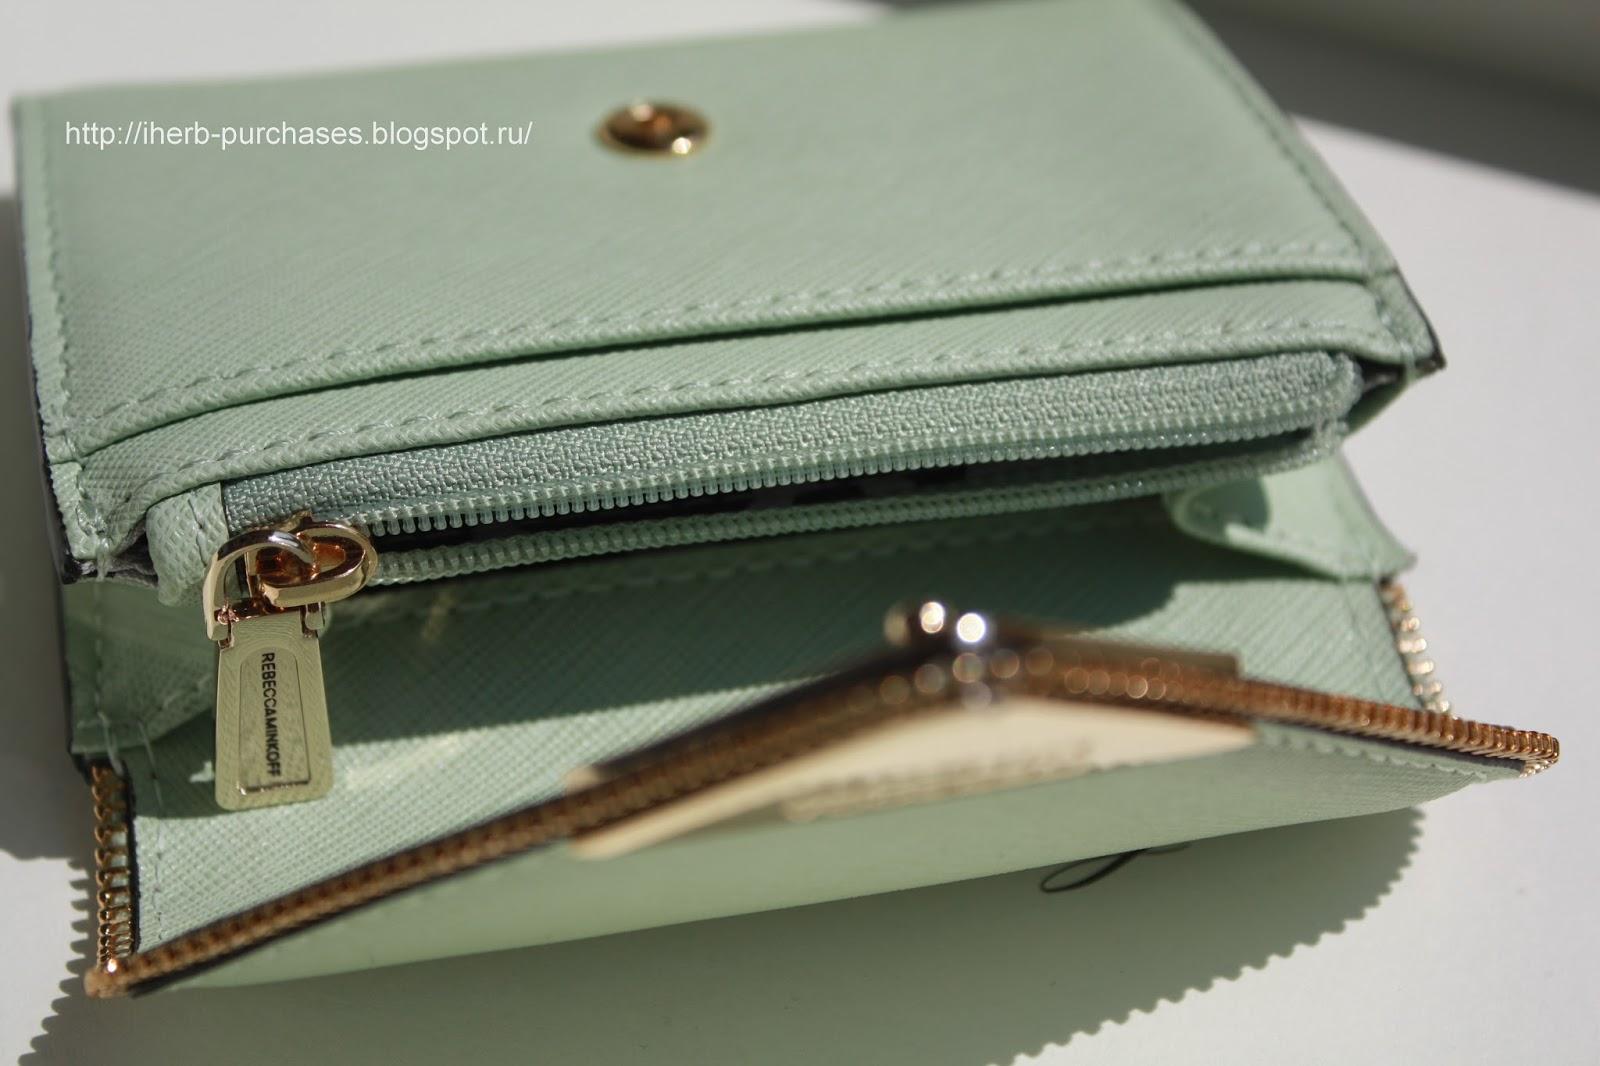 wallet кошелек Rebecca Мinkoff цена sale где купить